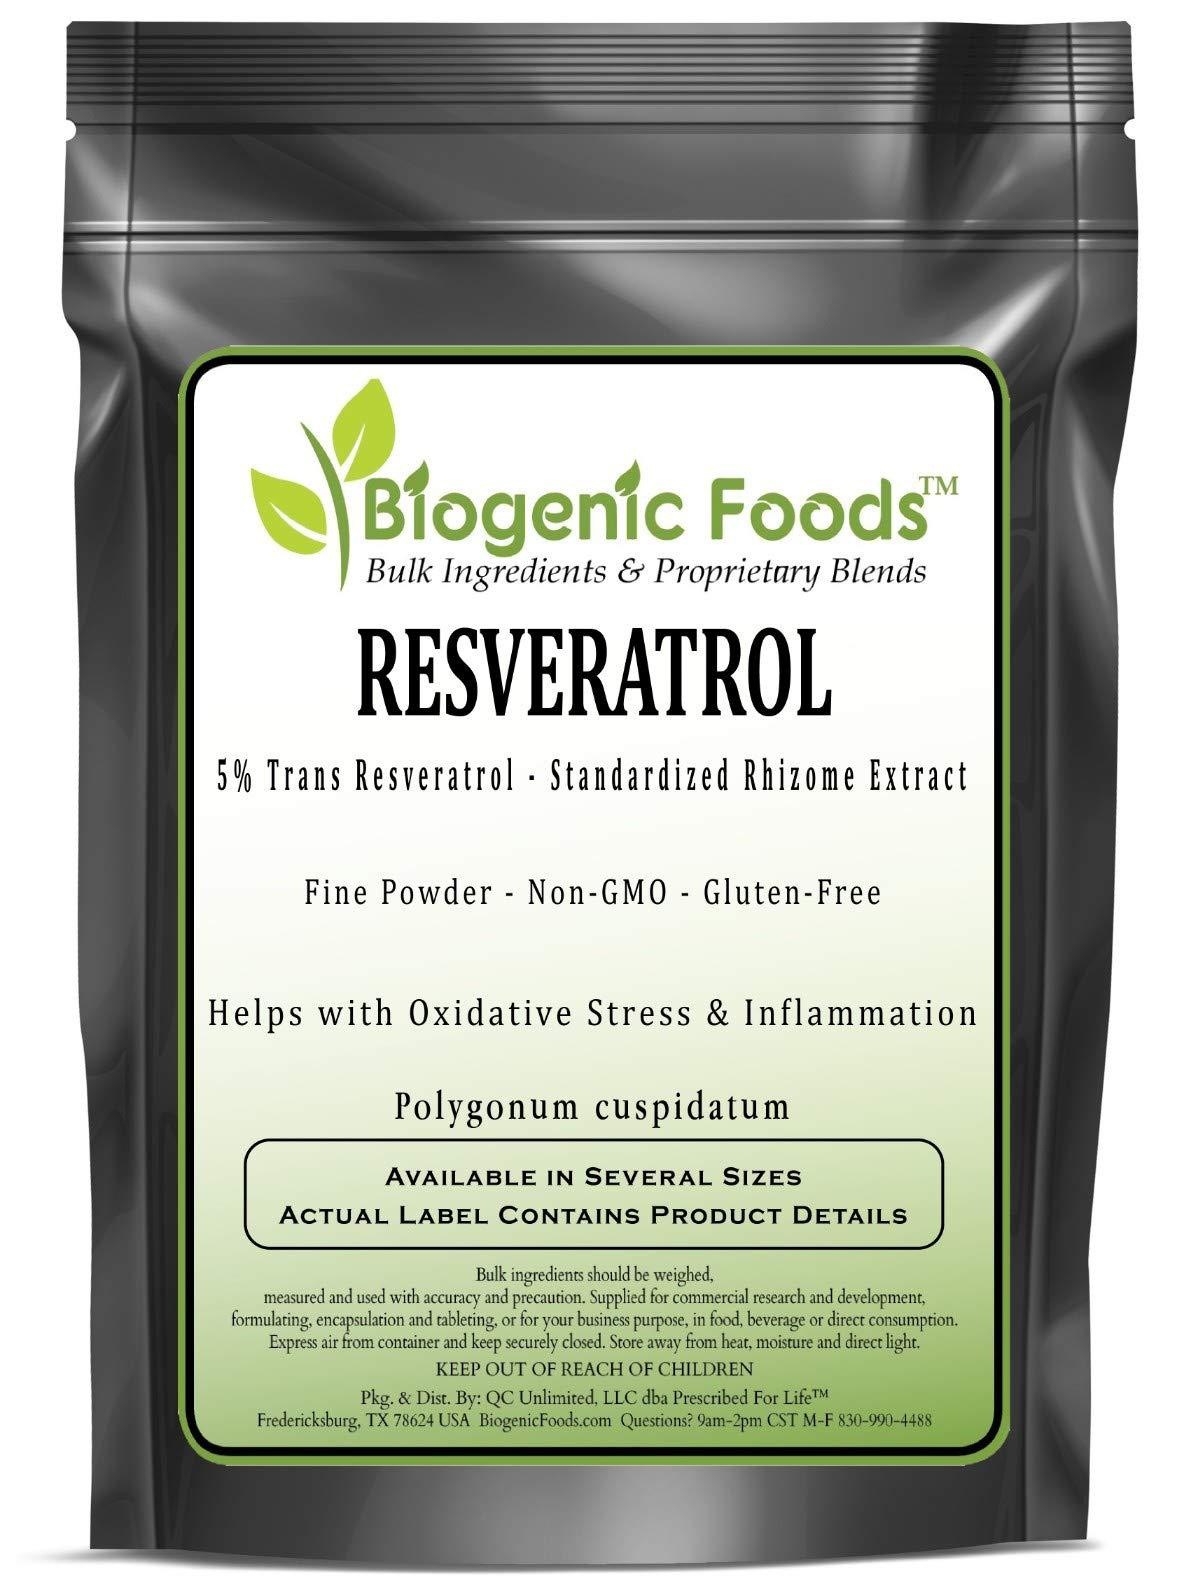 Resveratrol - 5% Trans Resveratrol - Standardized Rhizome Fine Powder Extract (Polygonum cuspidatum), 10 kg